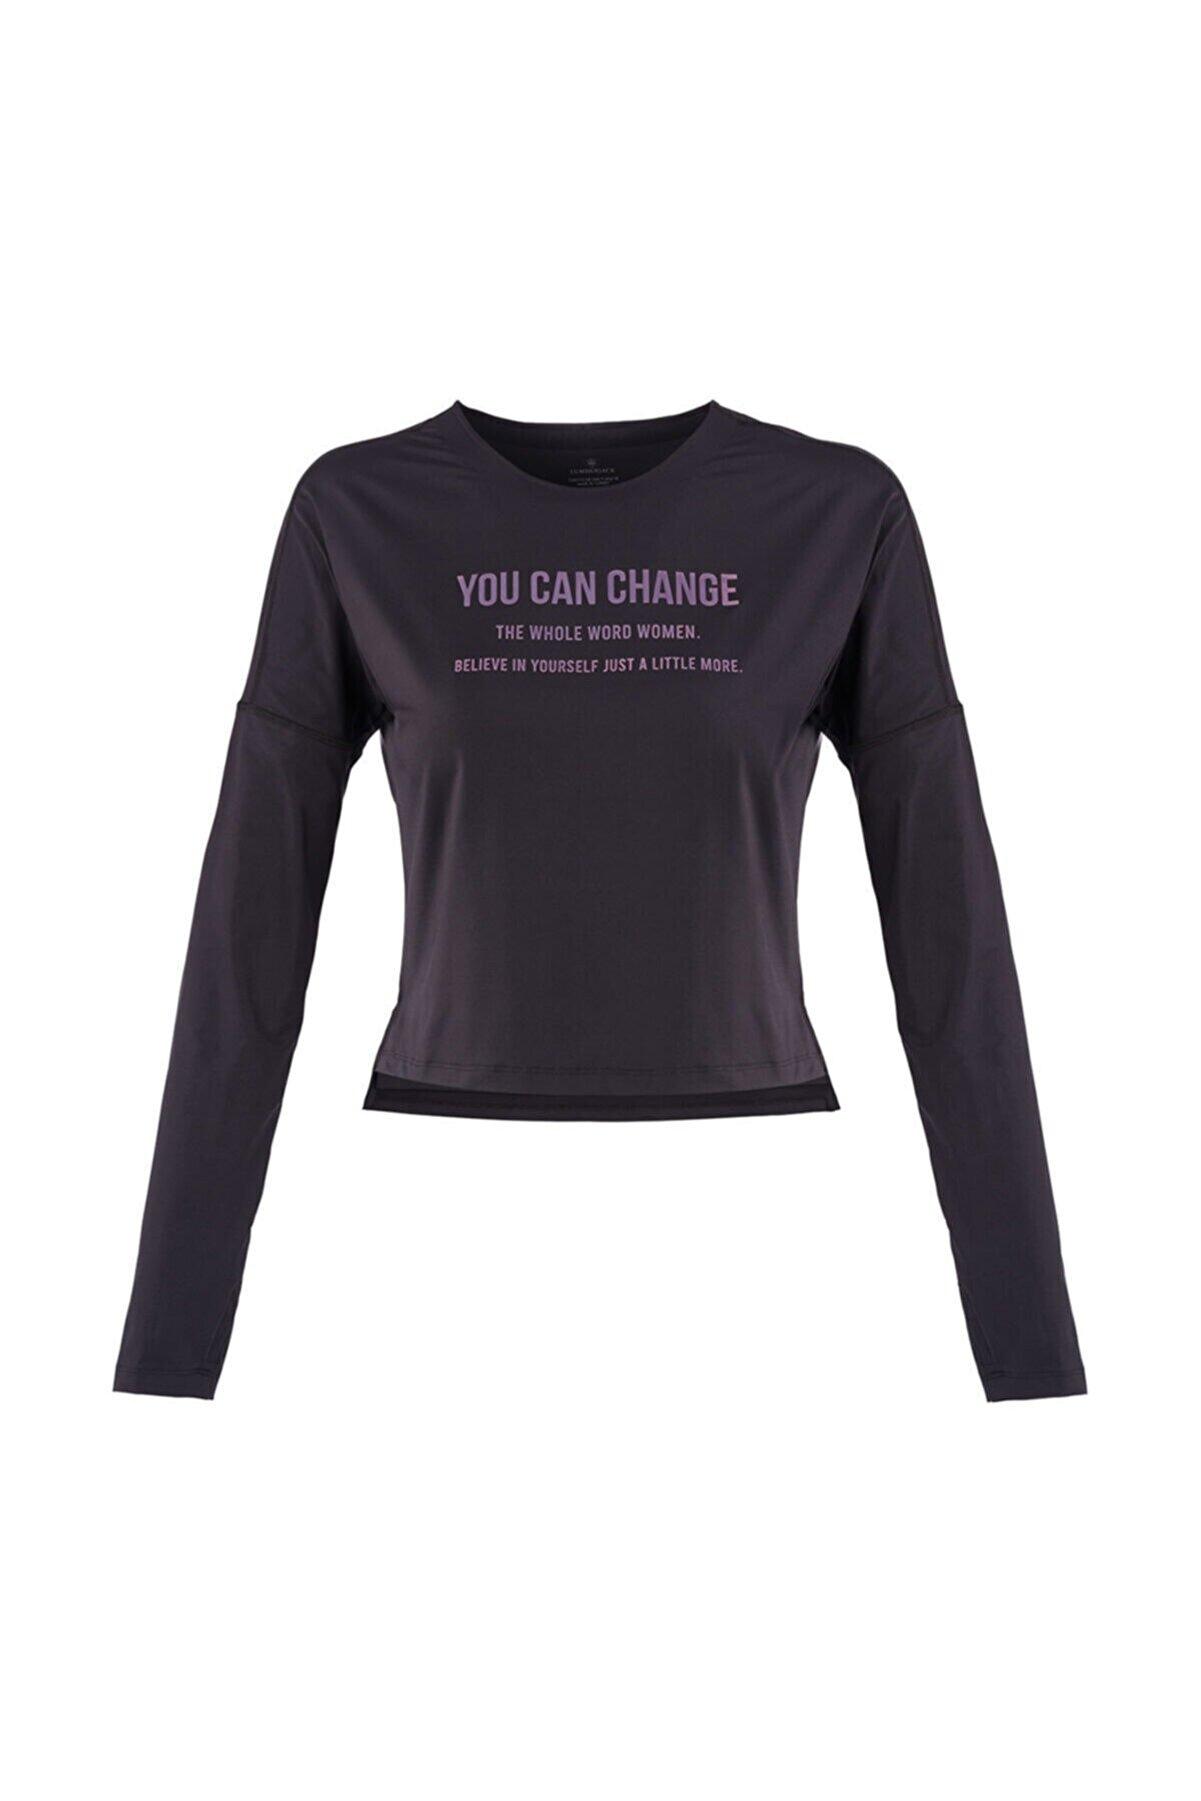 Lumberjack MARTA SLOGAN TOP Siyah Kadın T-Shirt 100559798